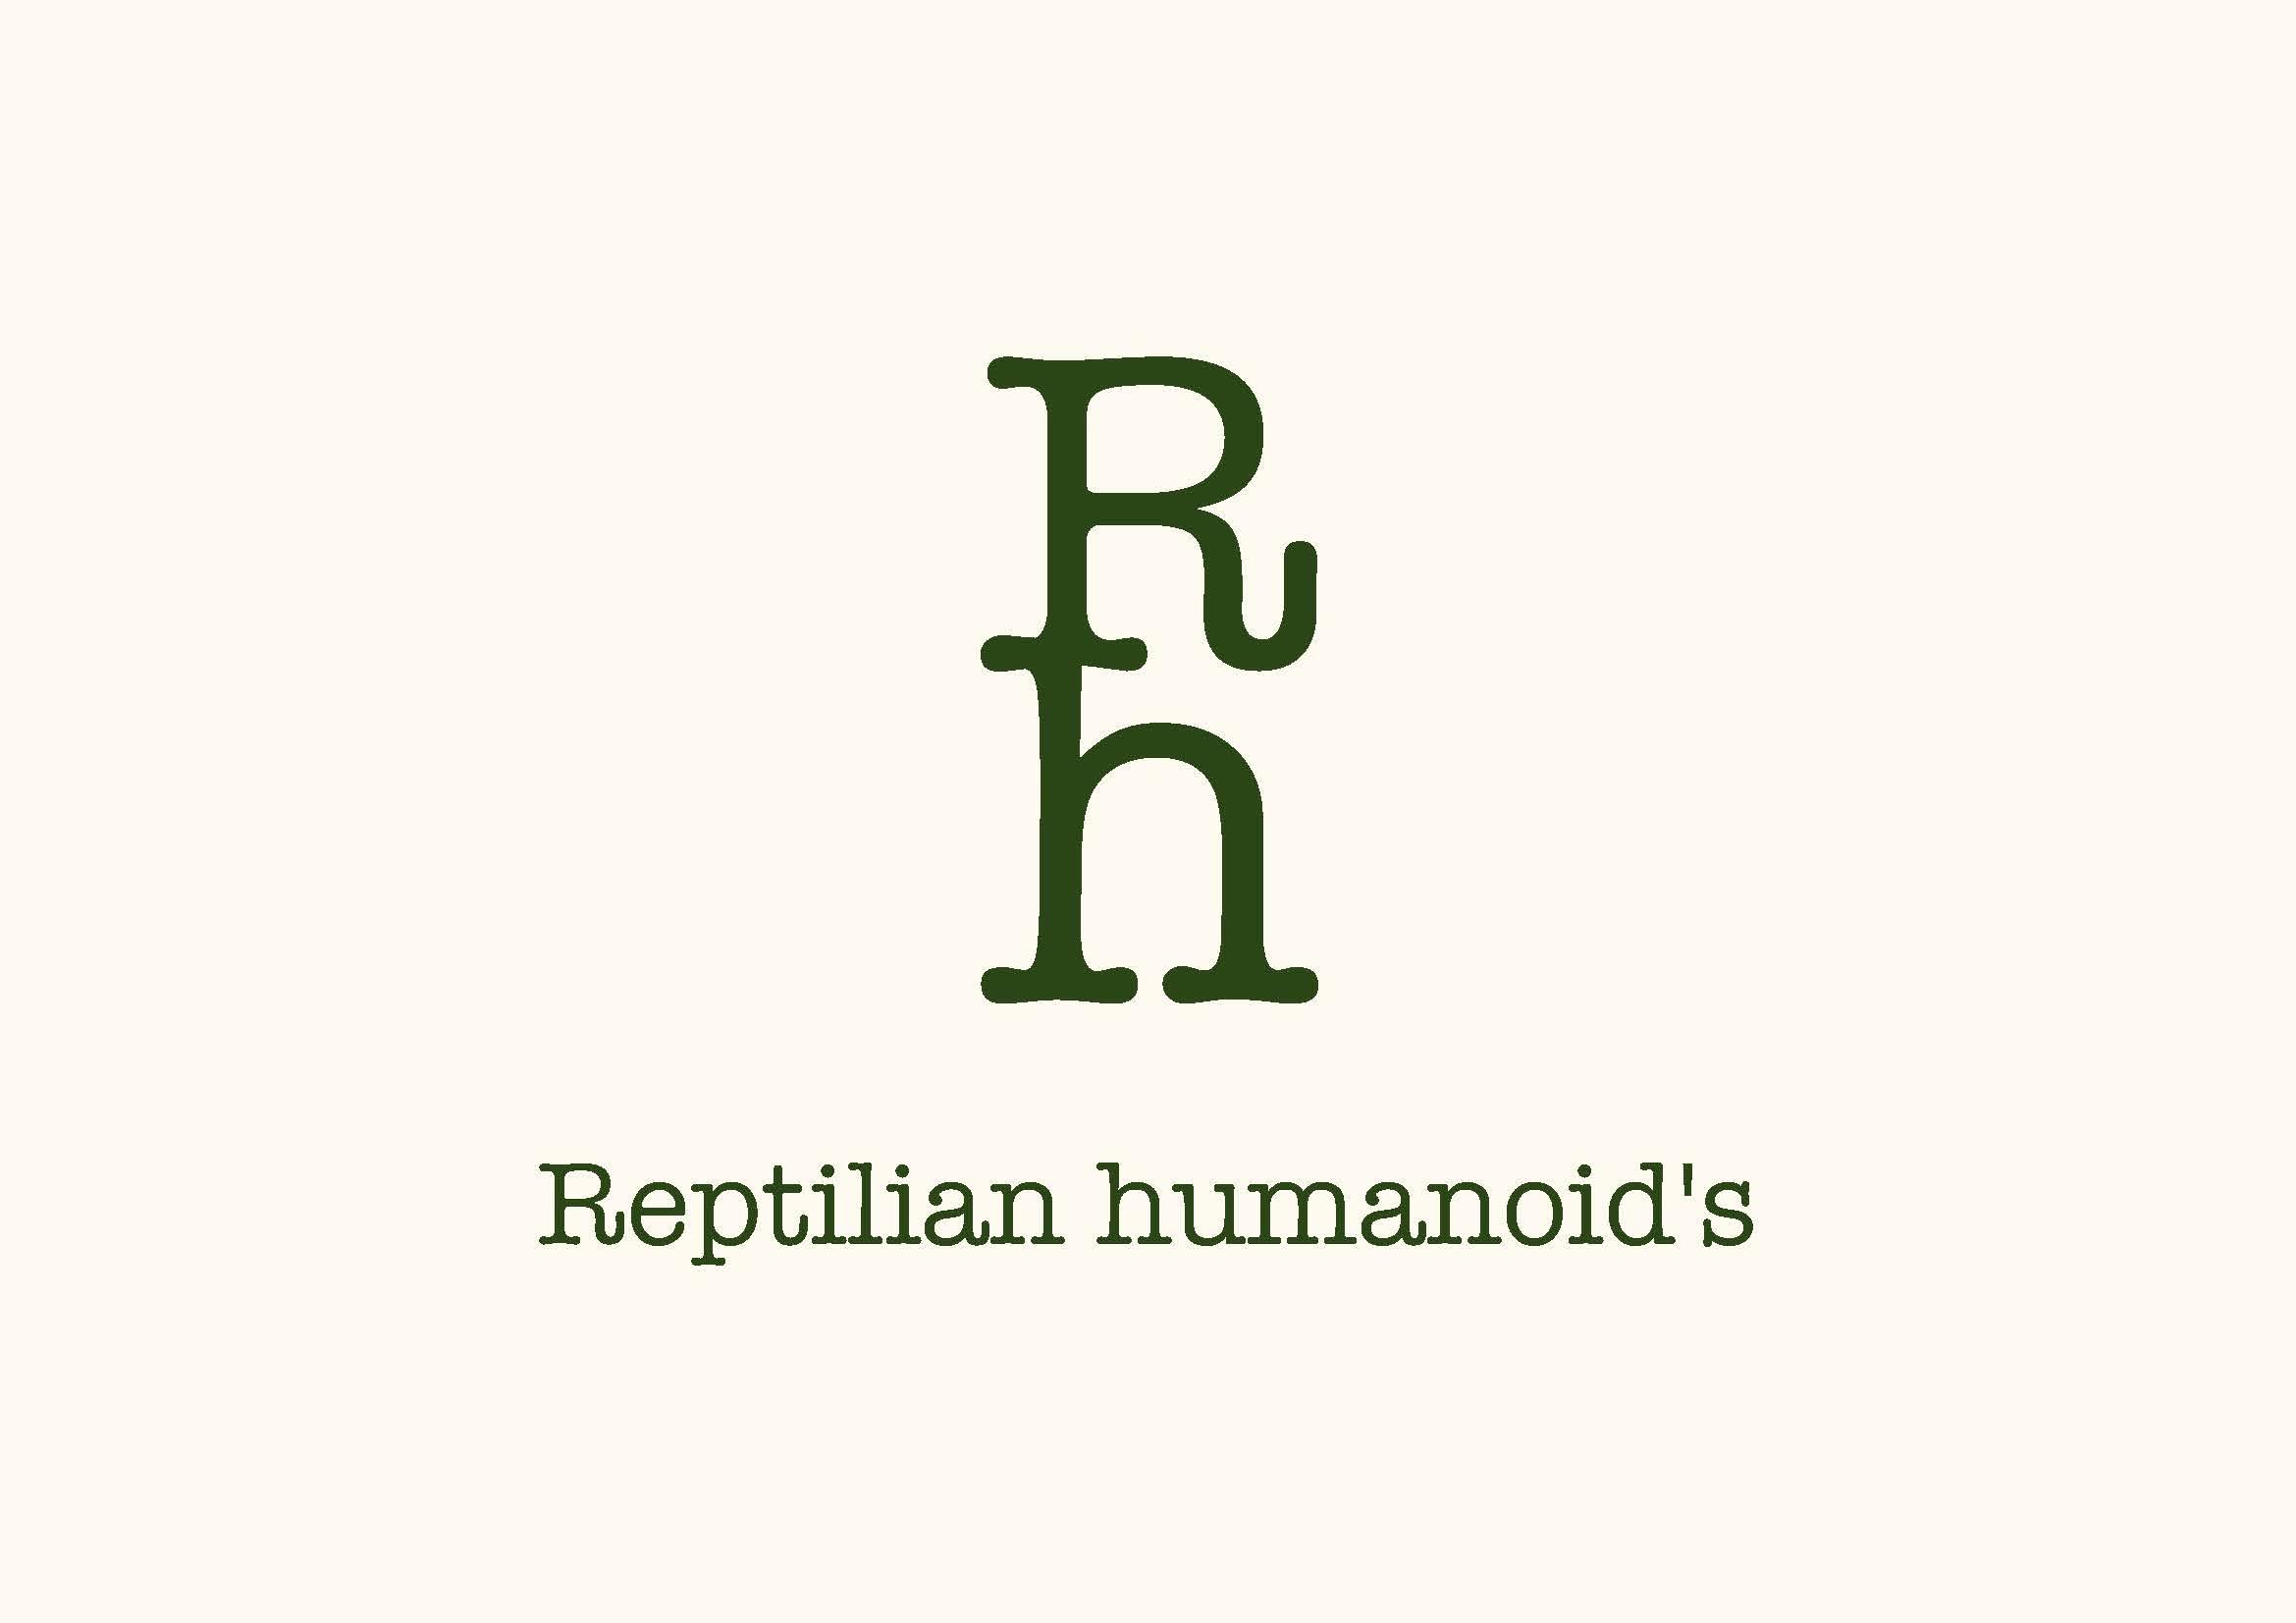 Reptilian humanoid's